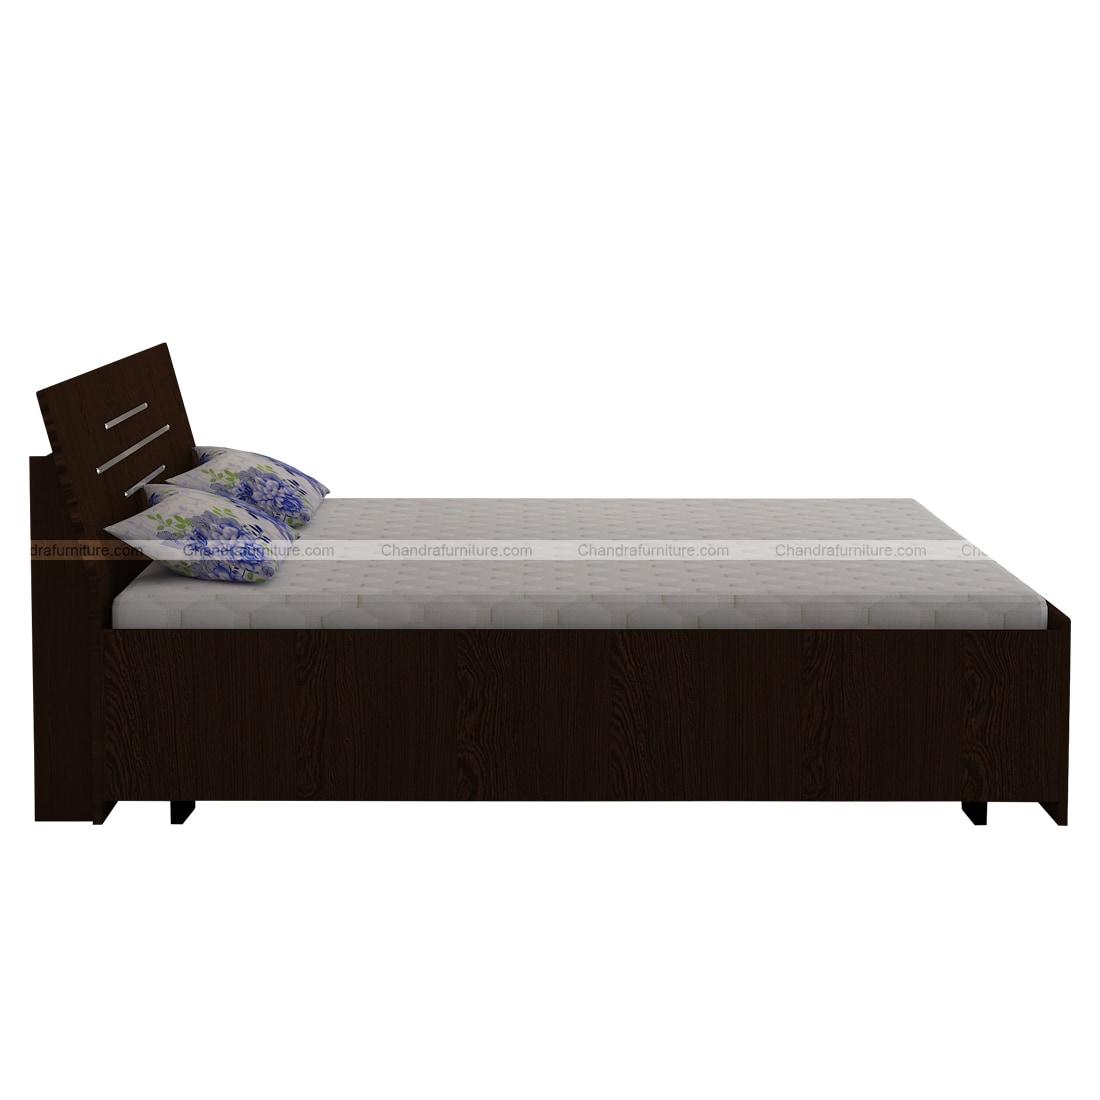 Chandra Furniture King Size Bed Senet 2